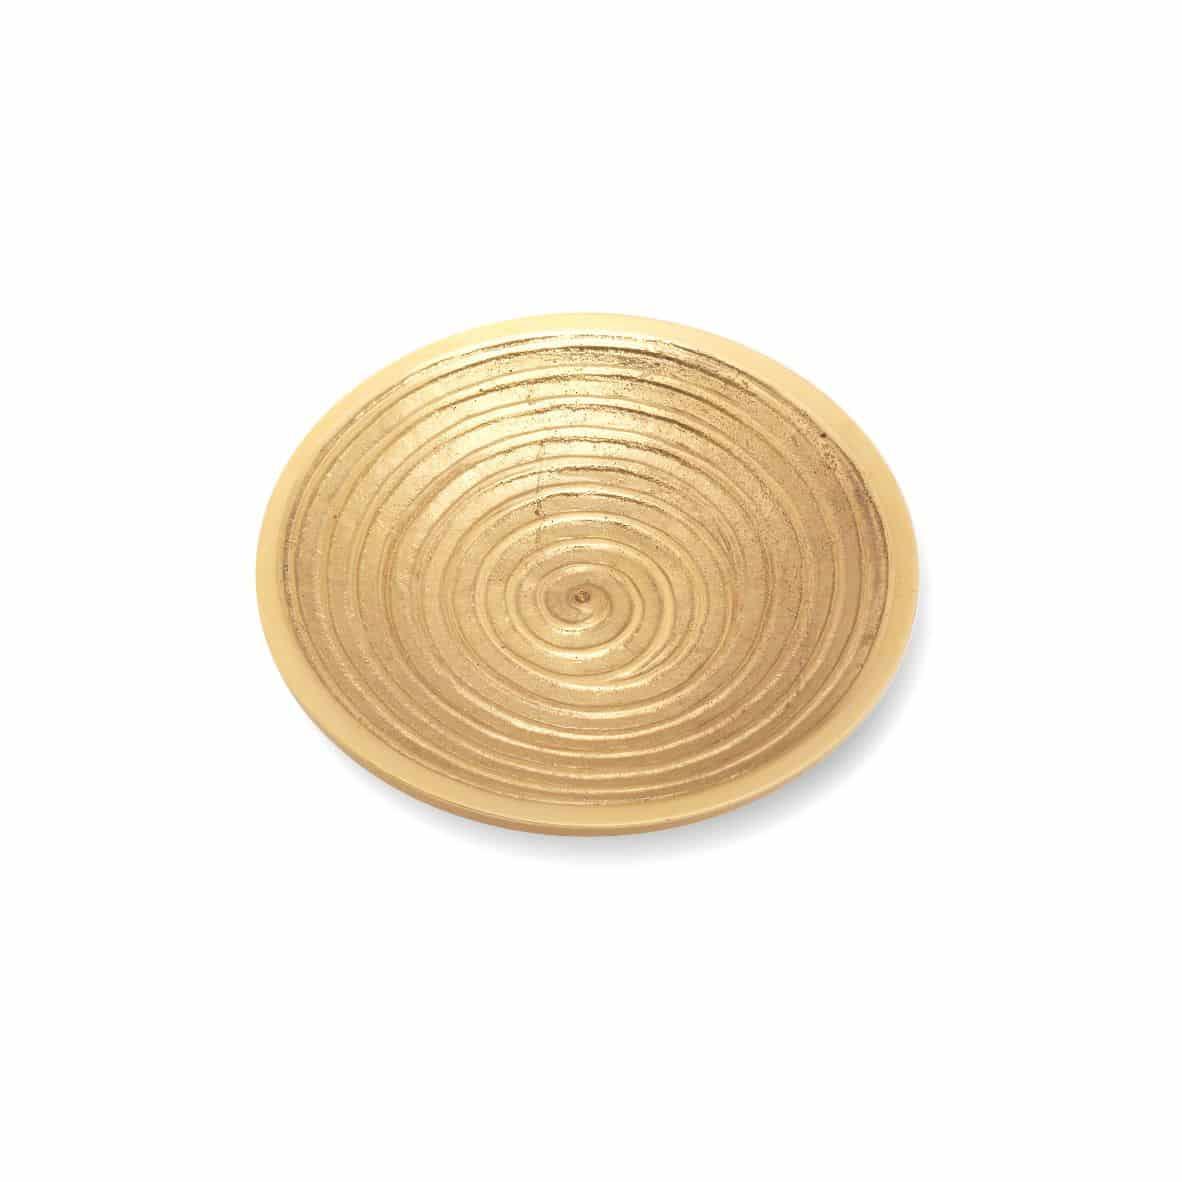 Rillenteller 100 mm, gold